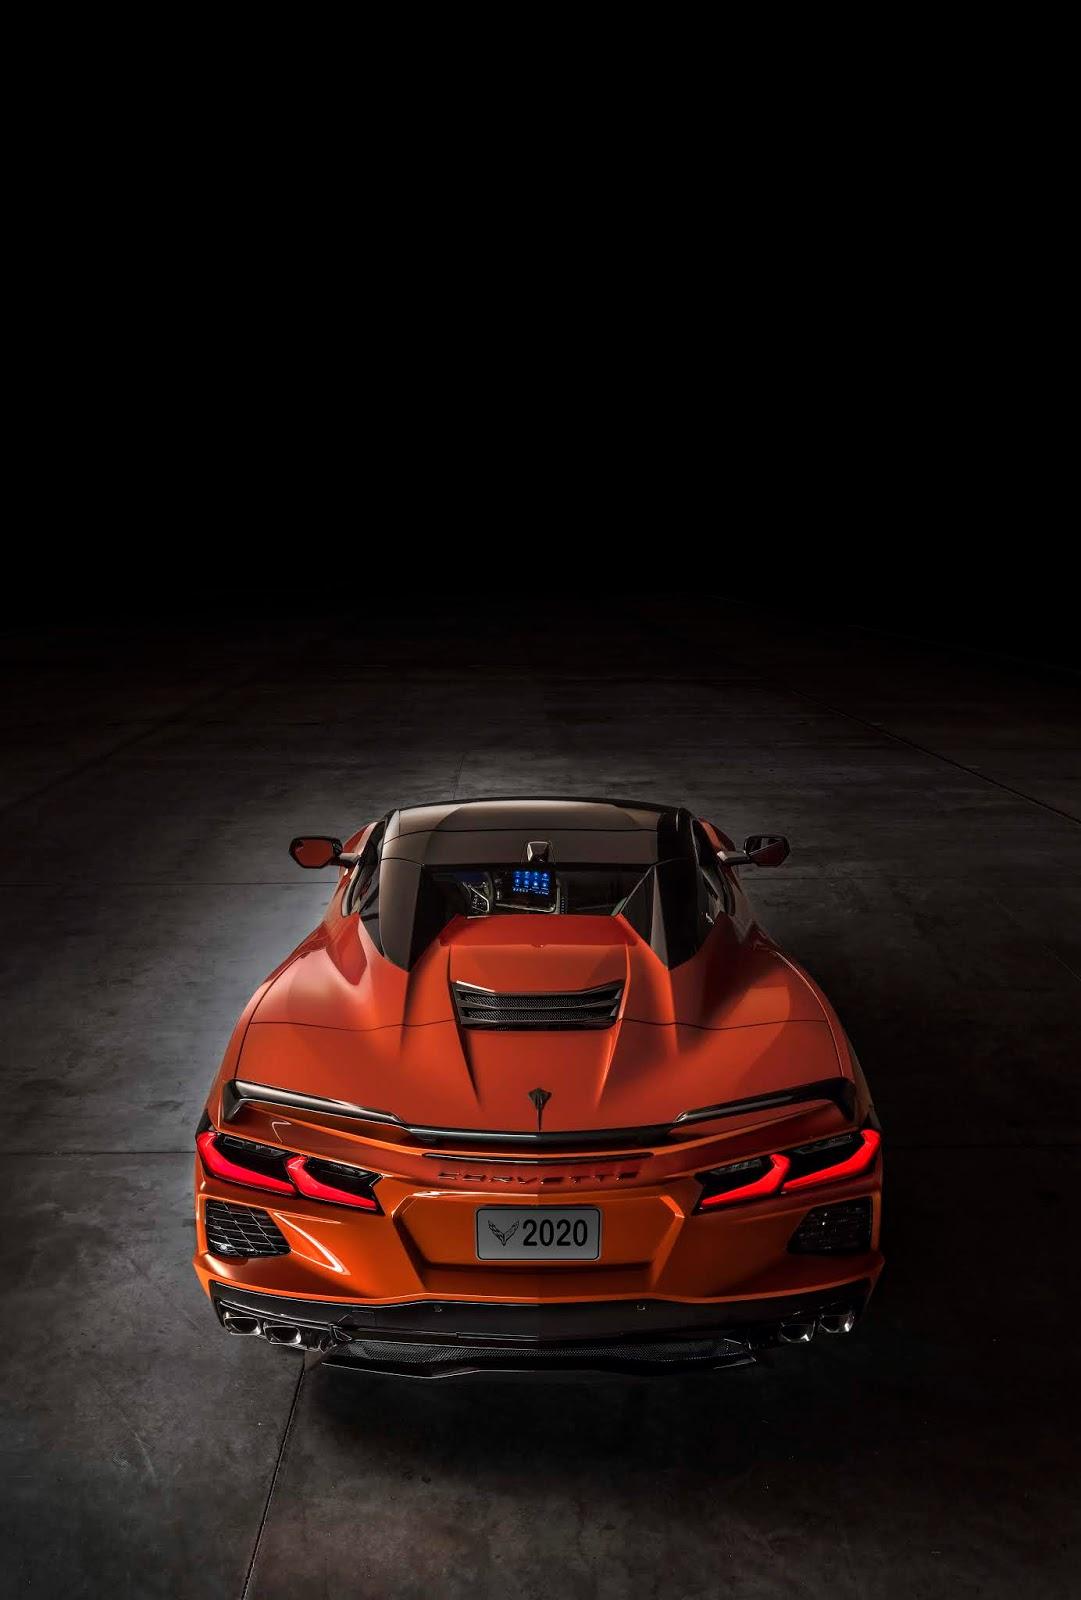 2020 Chevrolet Corvette Stingray Convertible 008 Γιατί η C8 Convertible είναι η καλύτερη Corvette ever C8, Chevrolet, Chevrolet Corvette, Corvette, zblog, ειδήσεις, καινούργιο, καινούρια, καινούριο